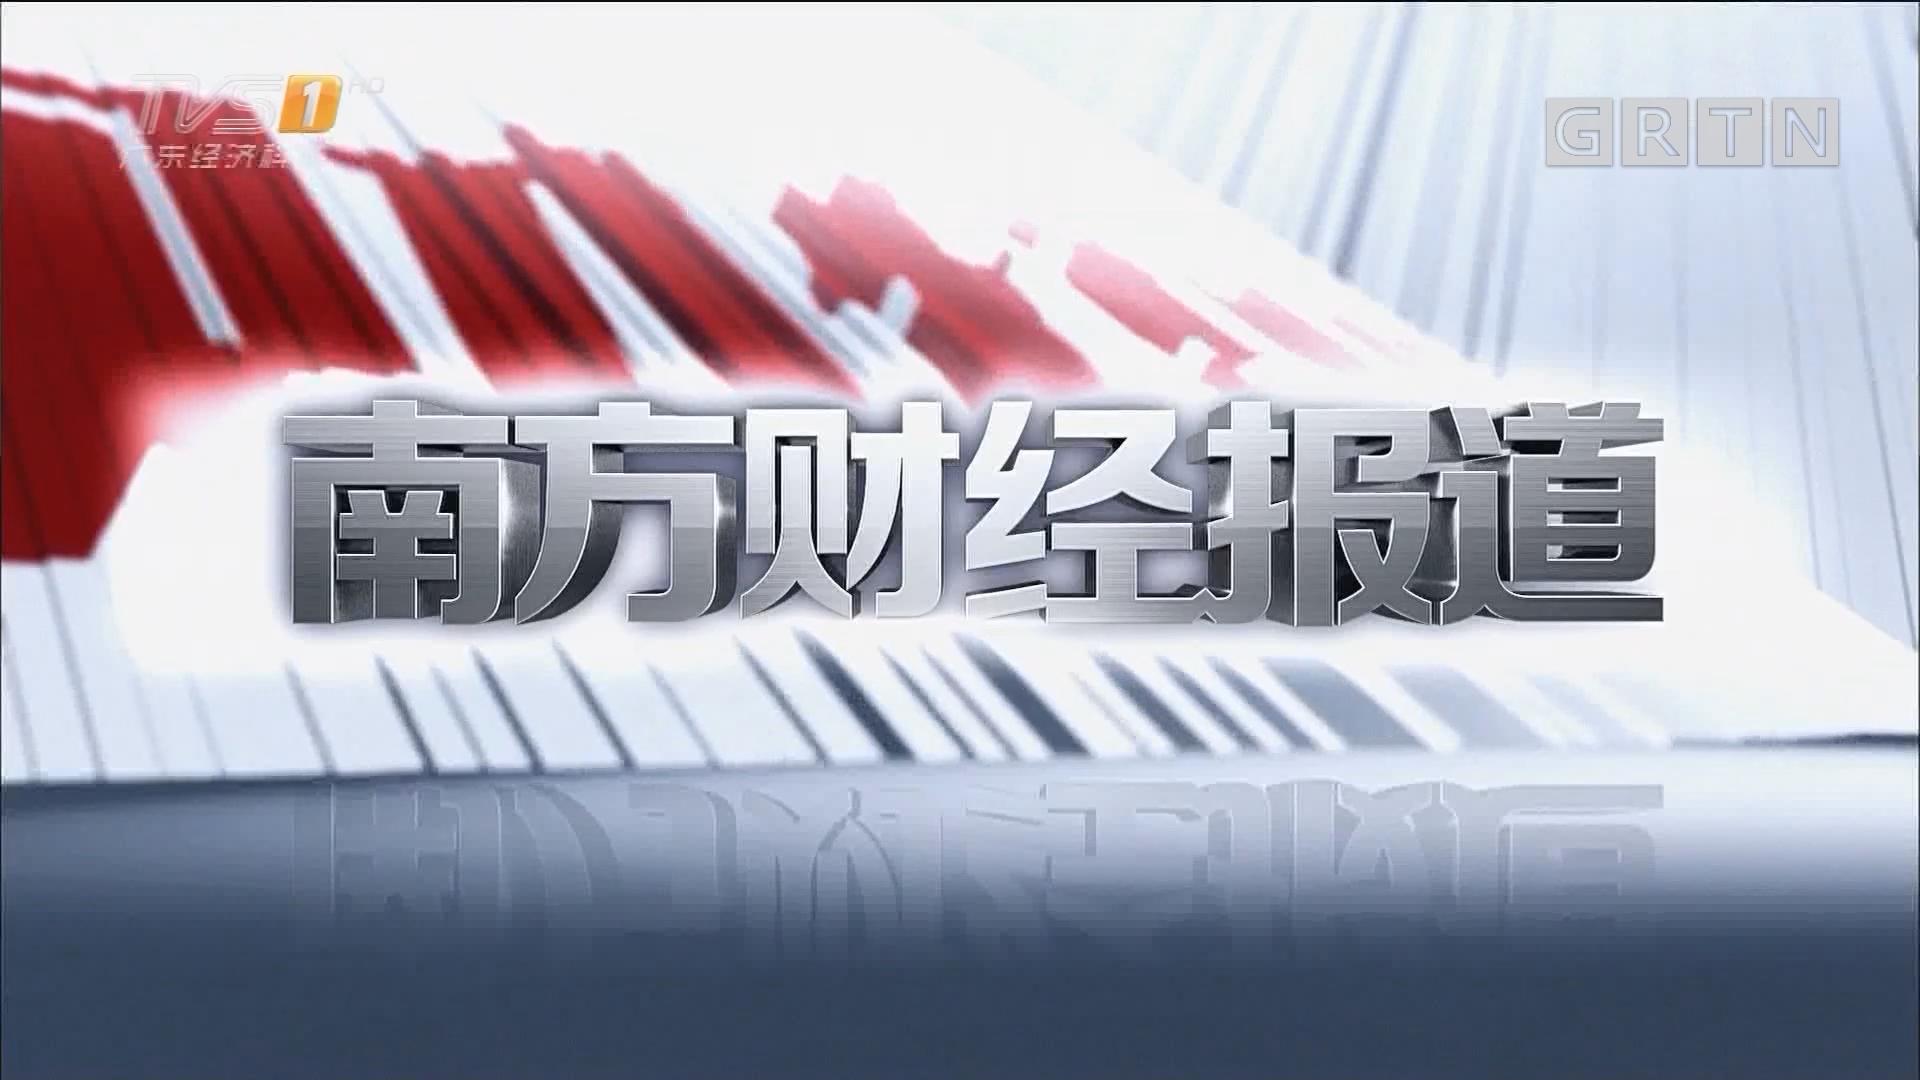 [HD][2019-03-14]南方财经报道:两会热点 外商投资法彰显中国进一步扩大对外开放决心